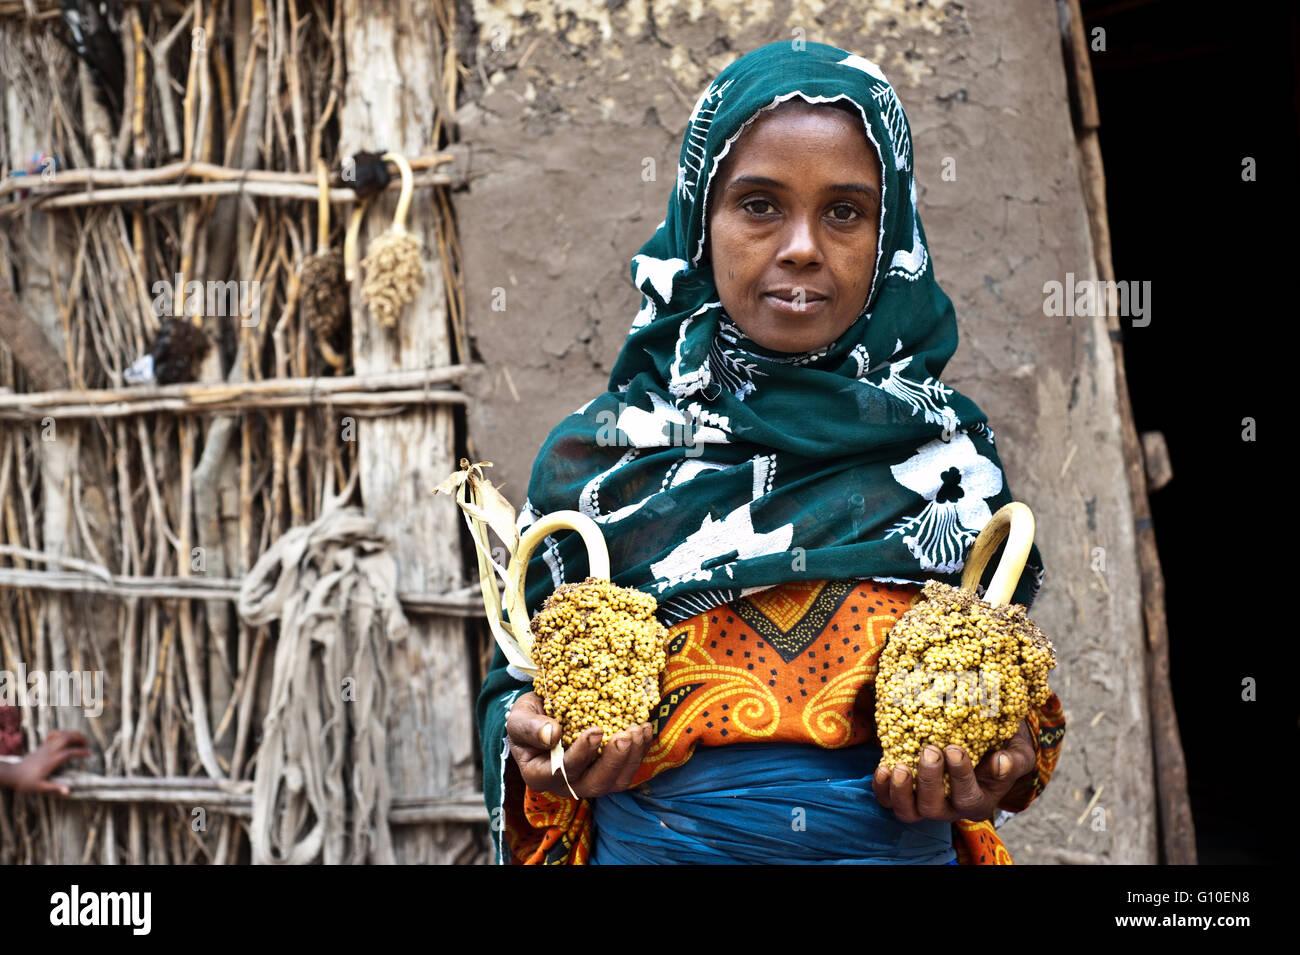 Muslim woman holding sorghum ( Ethiopia) - Stock Image